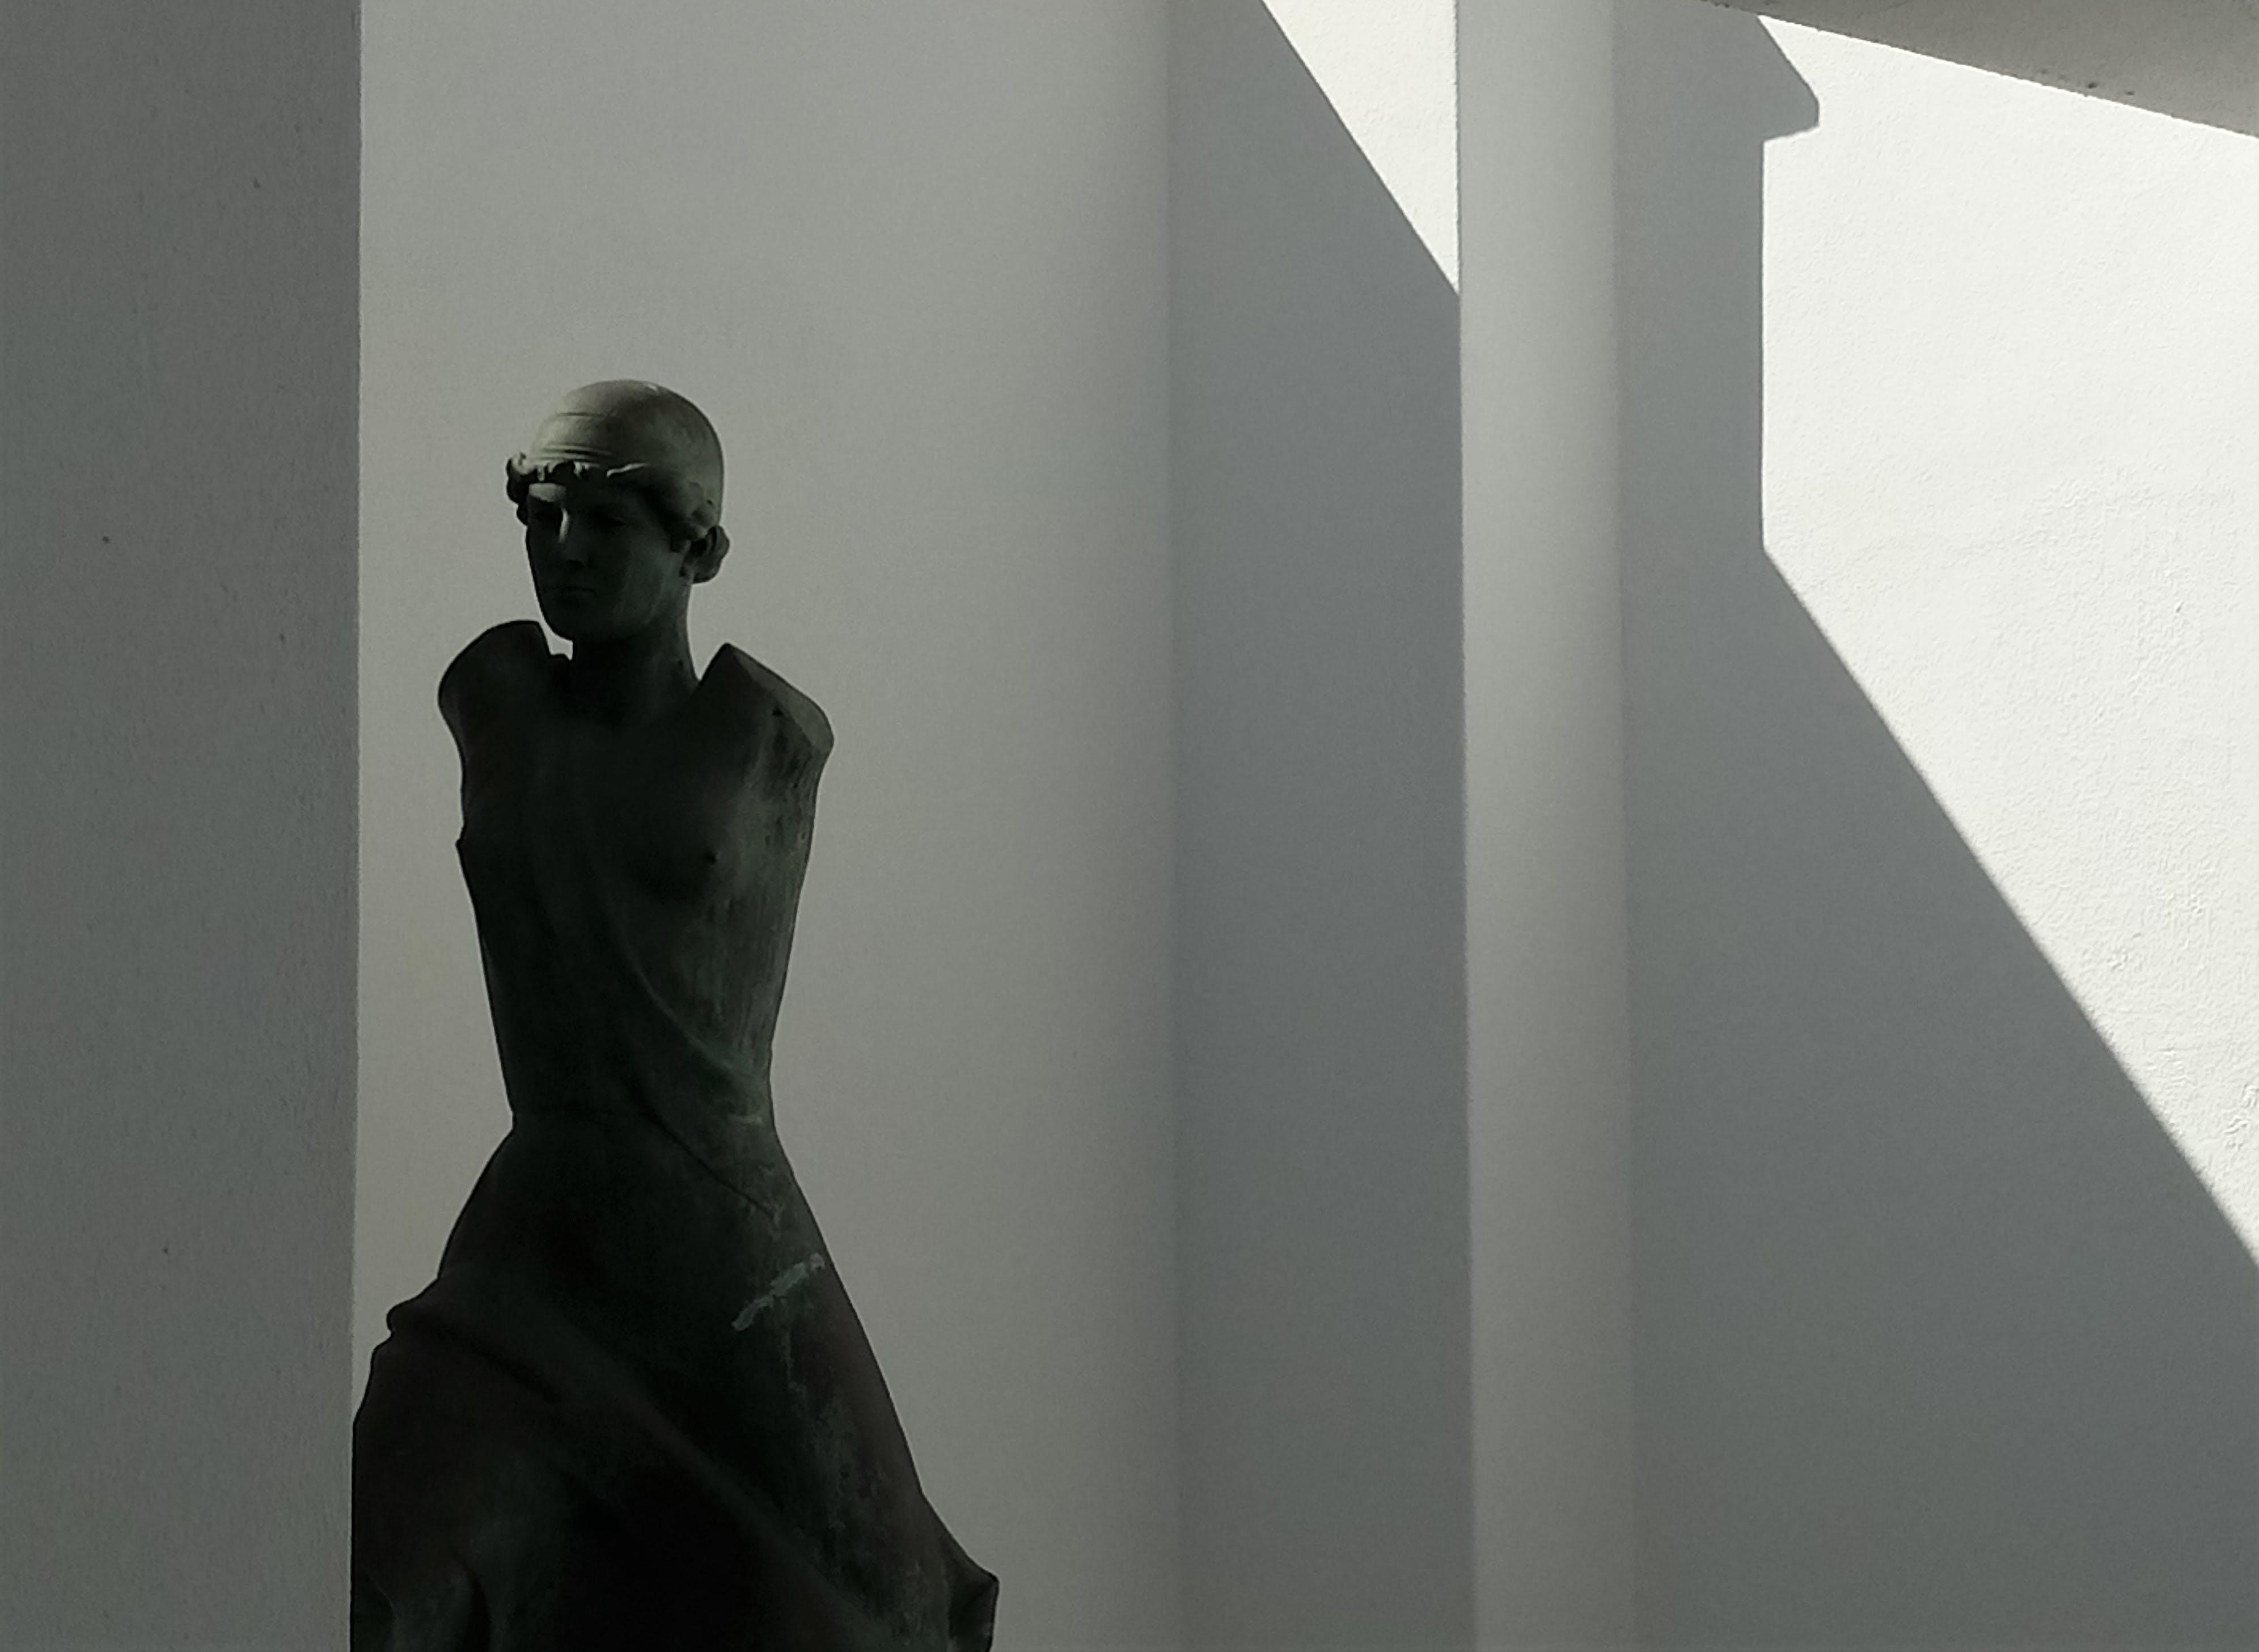 Free stock photo of art, bronze, bronze statue, contrast